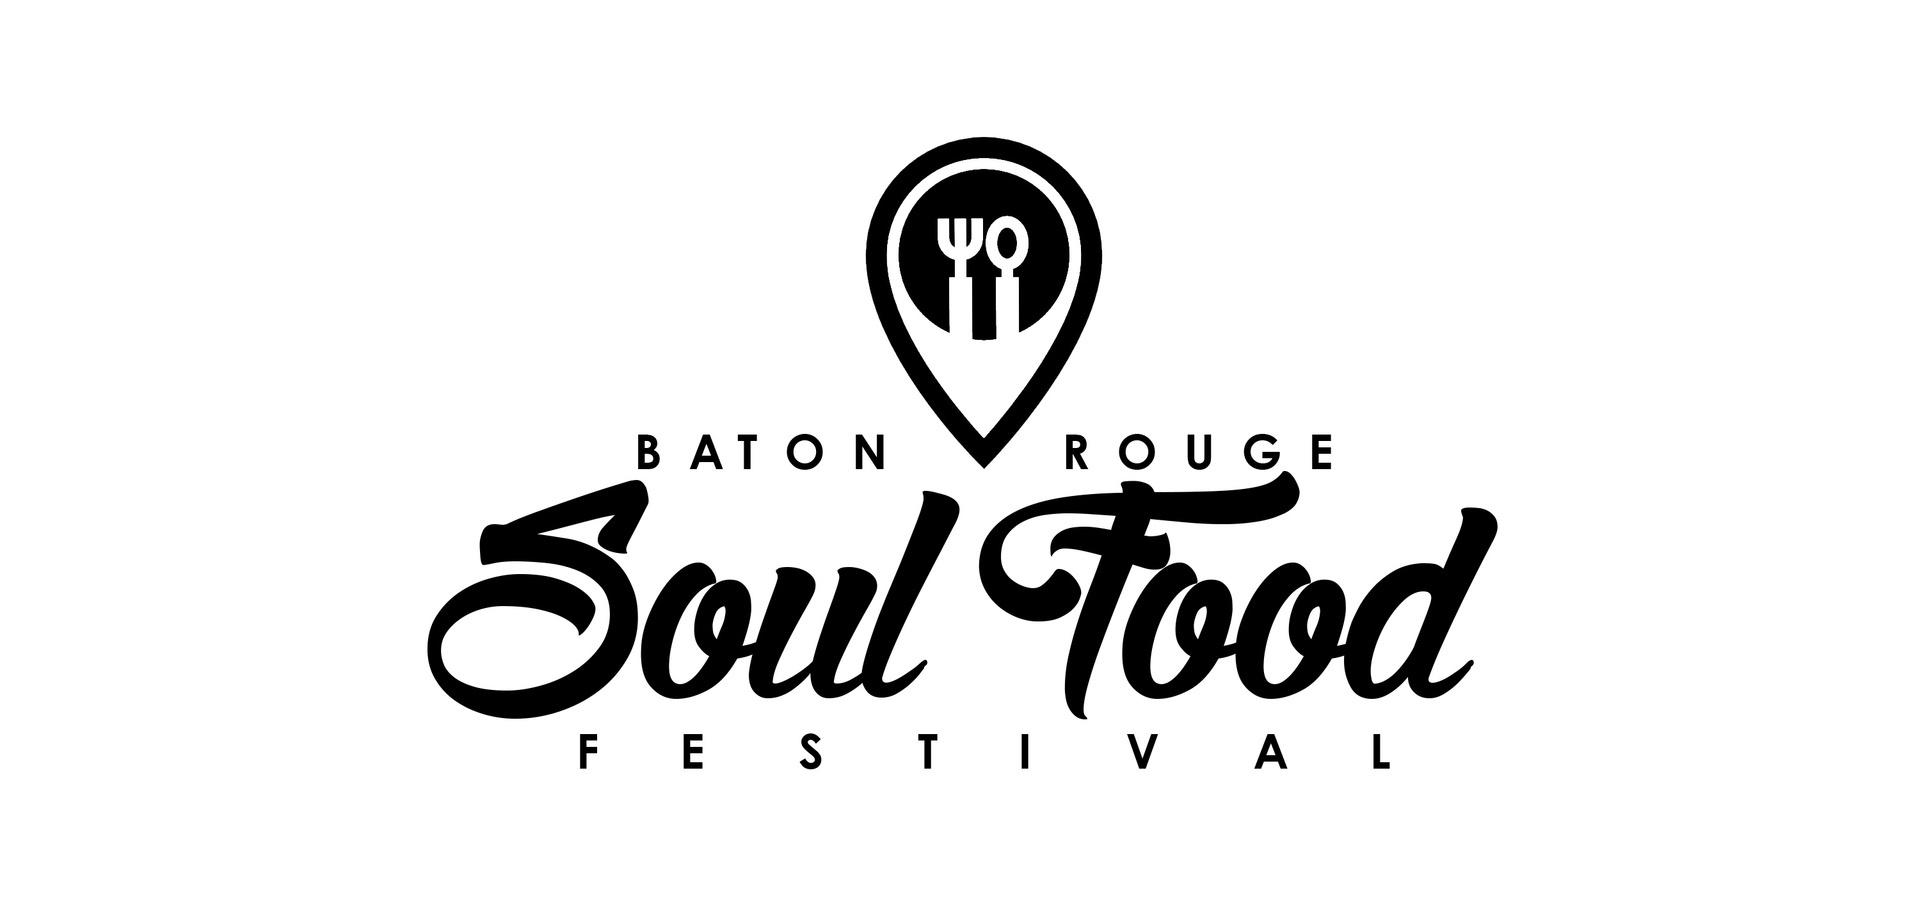 4th Annual Baton Rouge Soul Food Festival Pre-Party